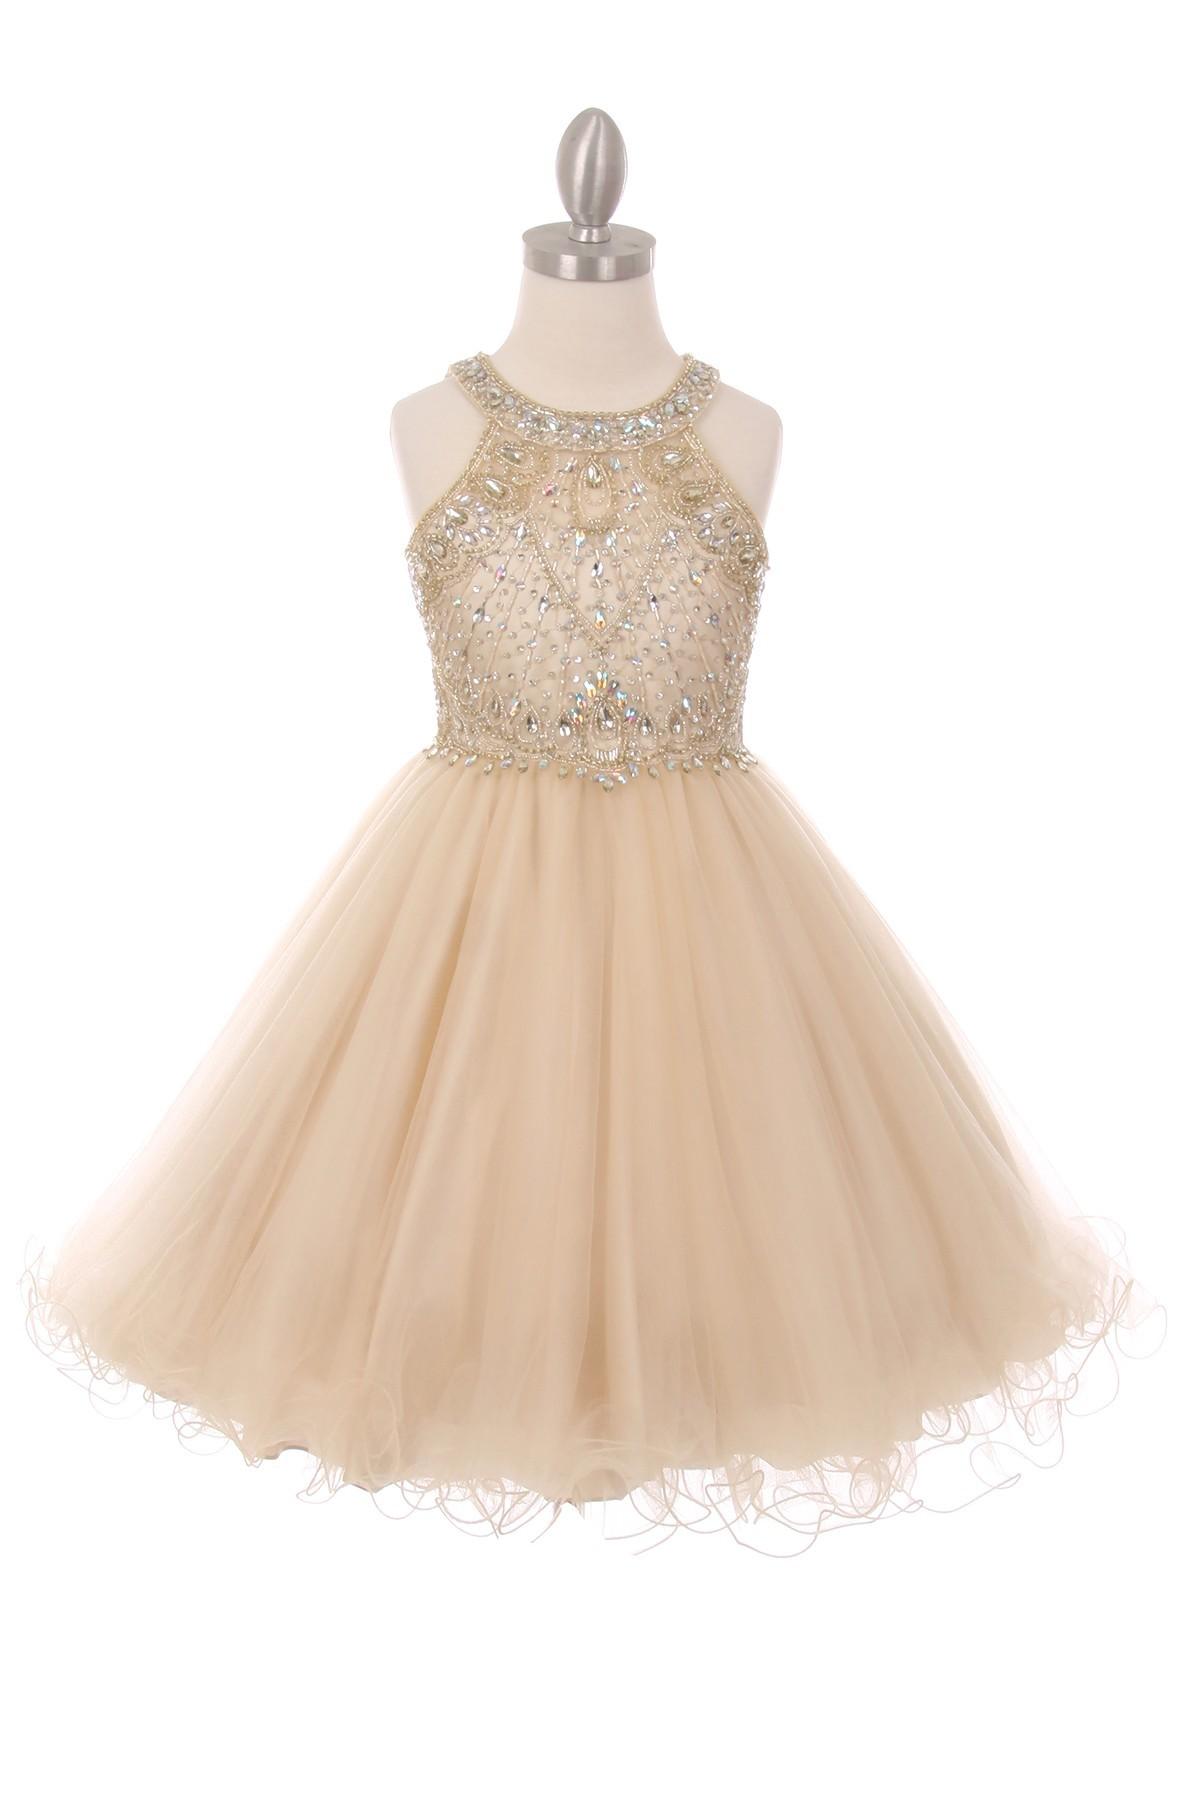 f98b37b61 Champagne girls rhinestone dress with open back. junior bridesmaid dress